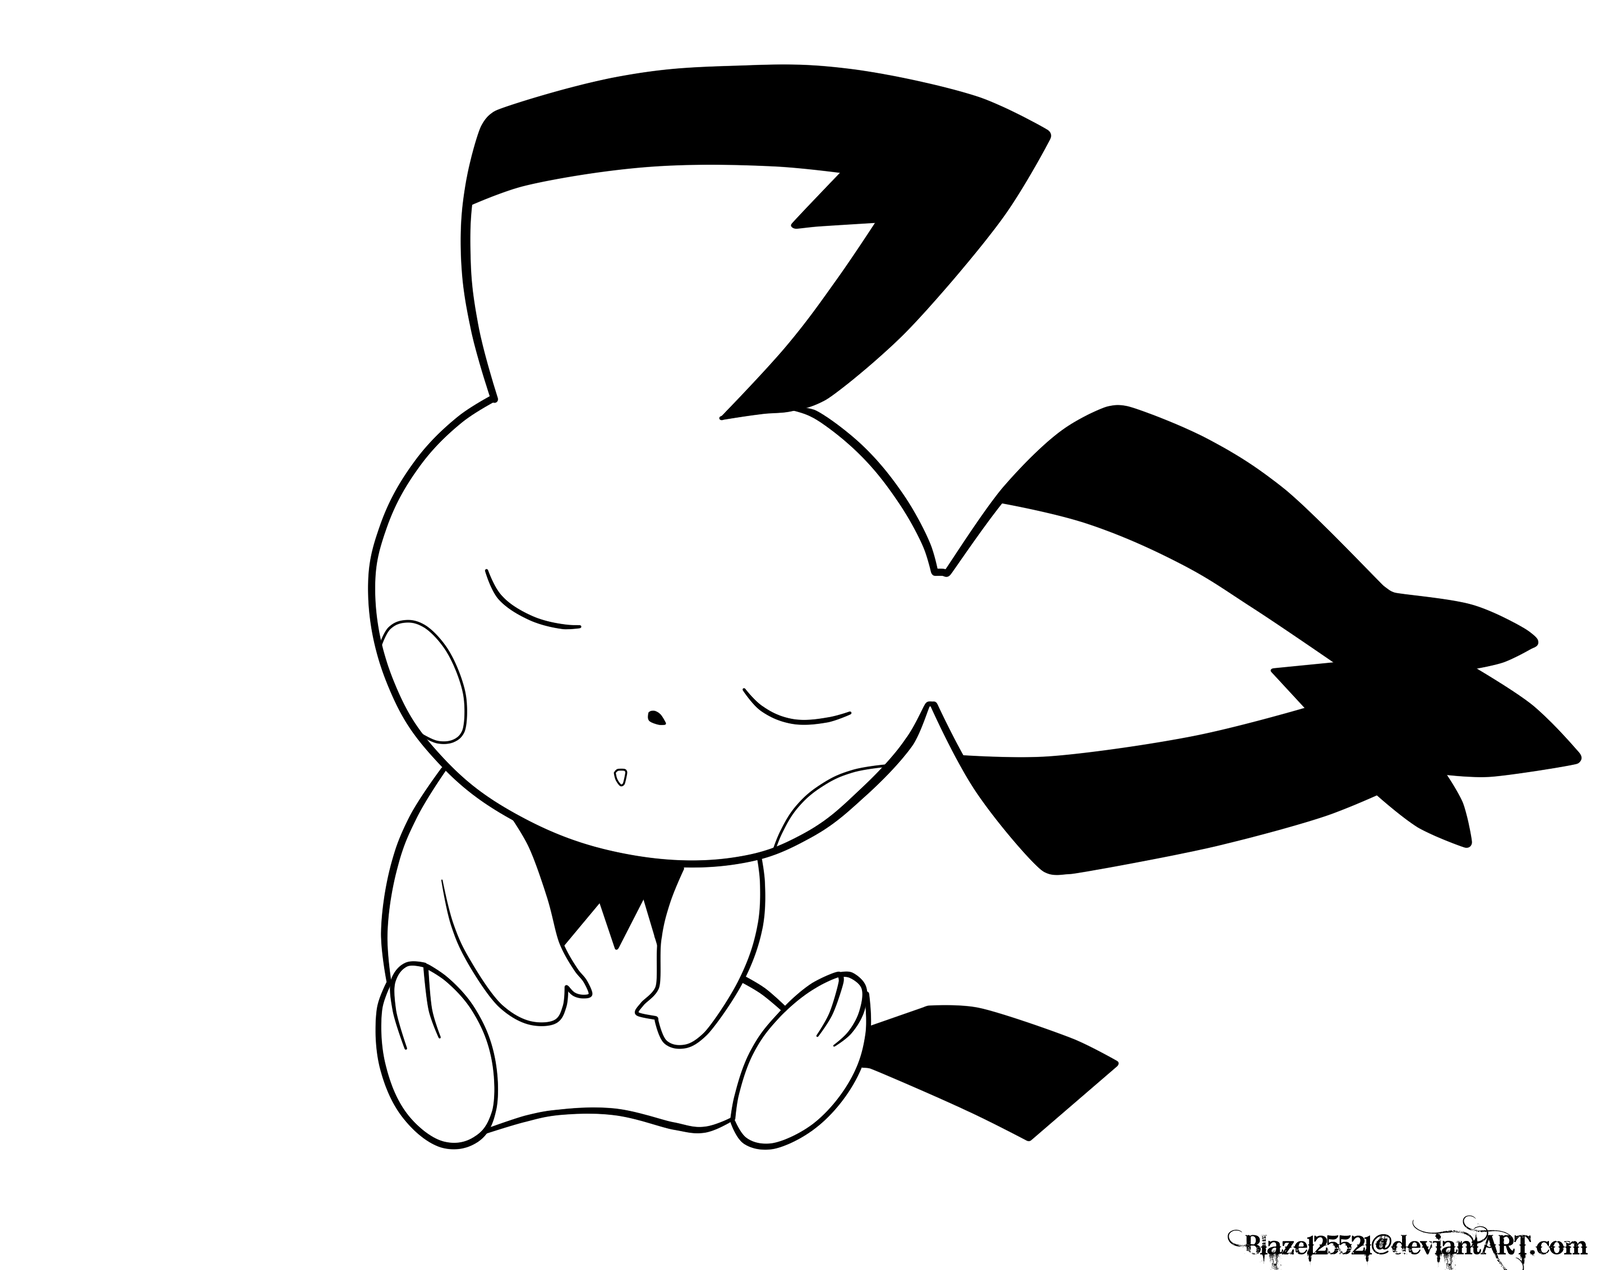 Sleeping Pichu Lineart by JamalC157 on DeviantArt